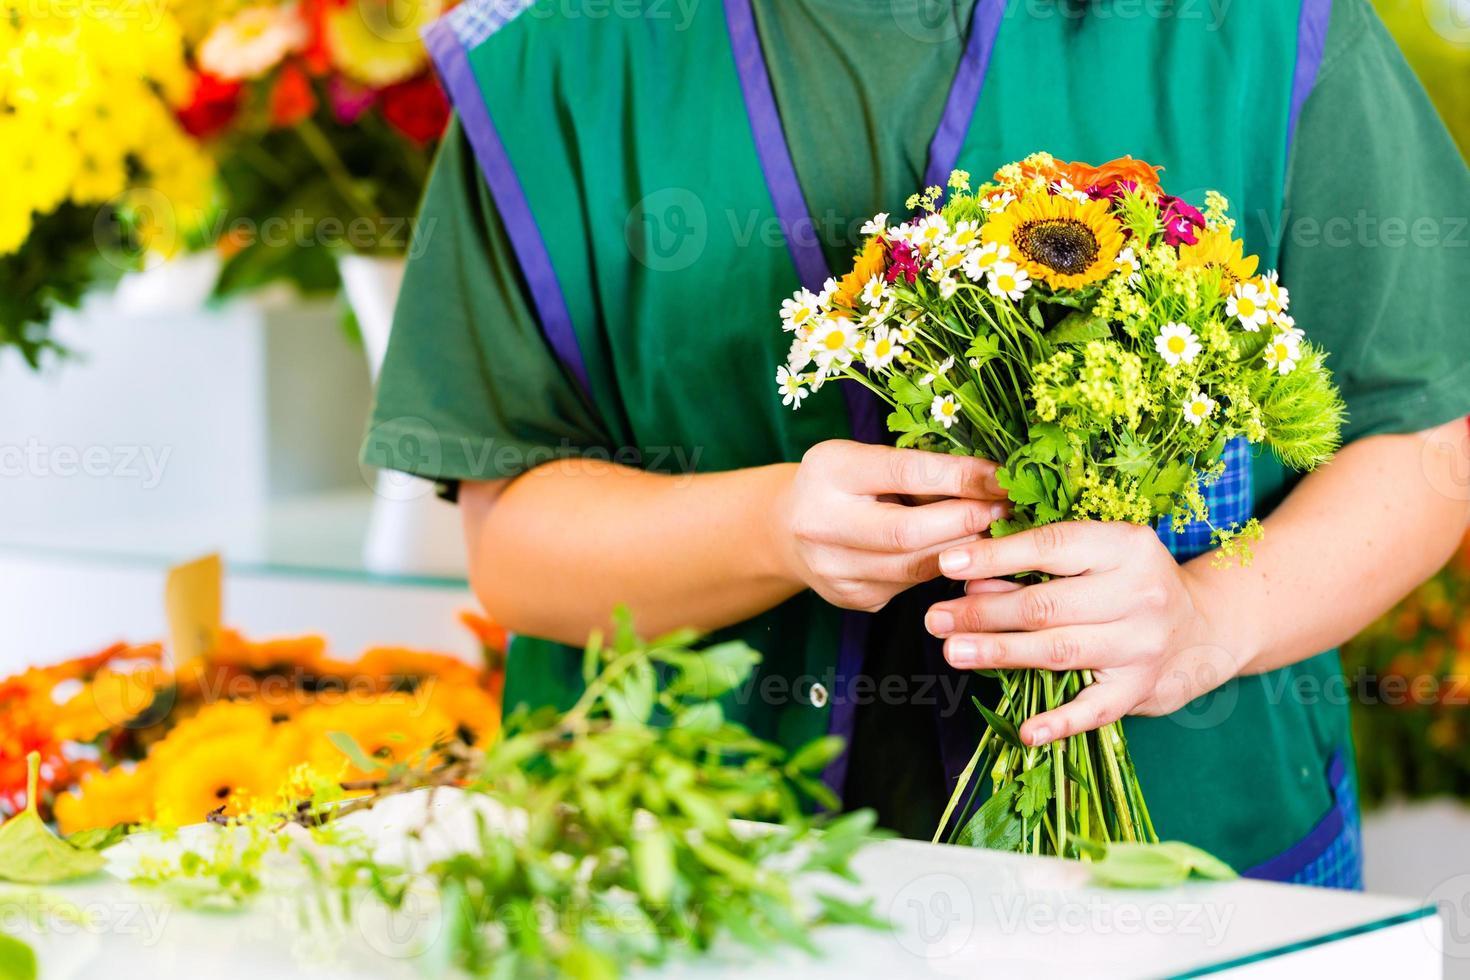 florista feminina em floricultura foto